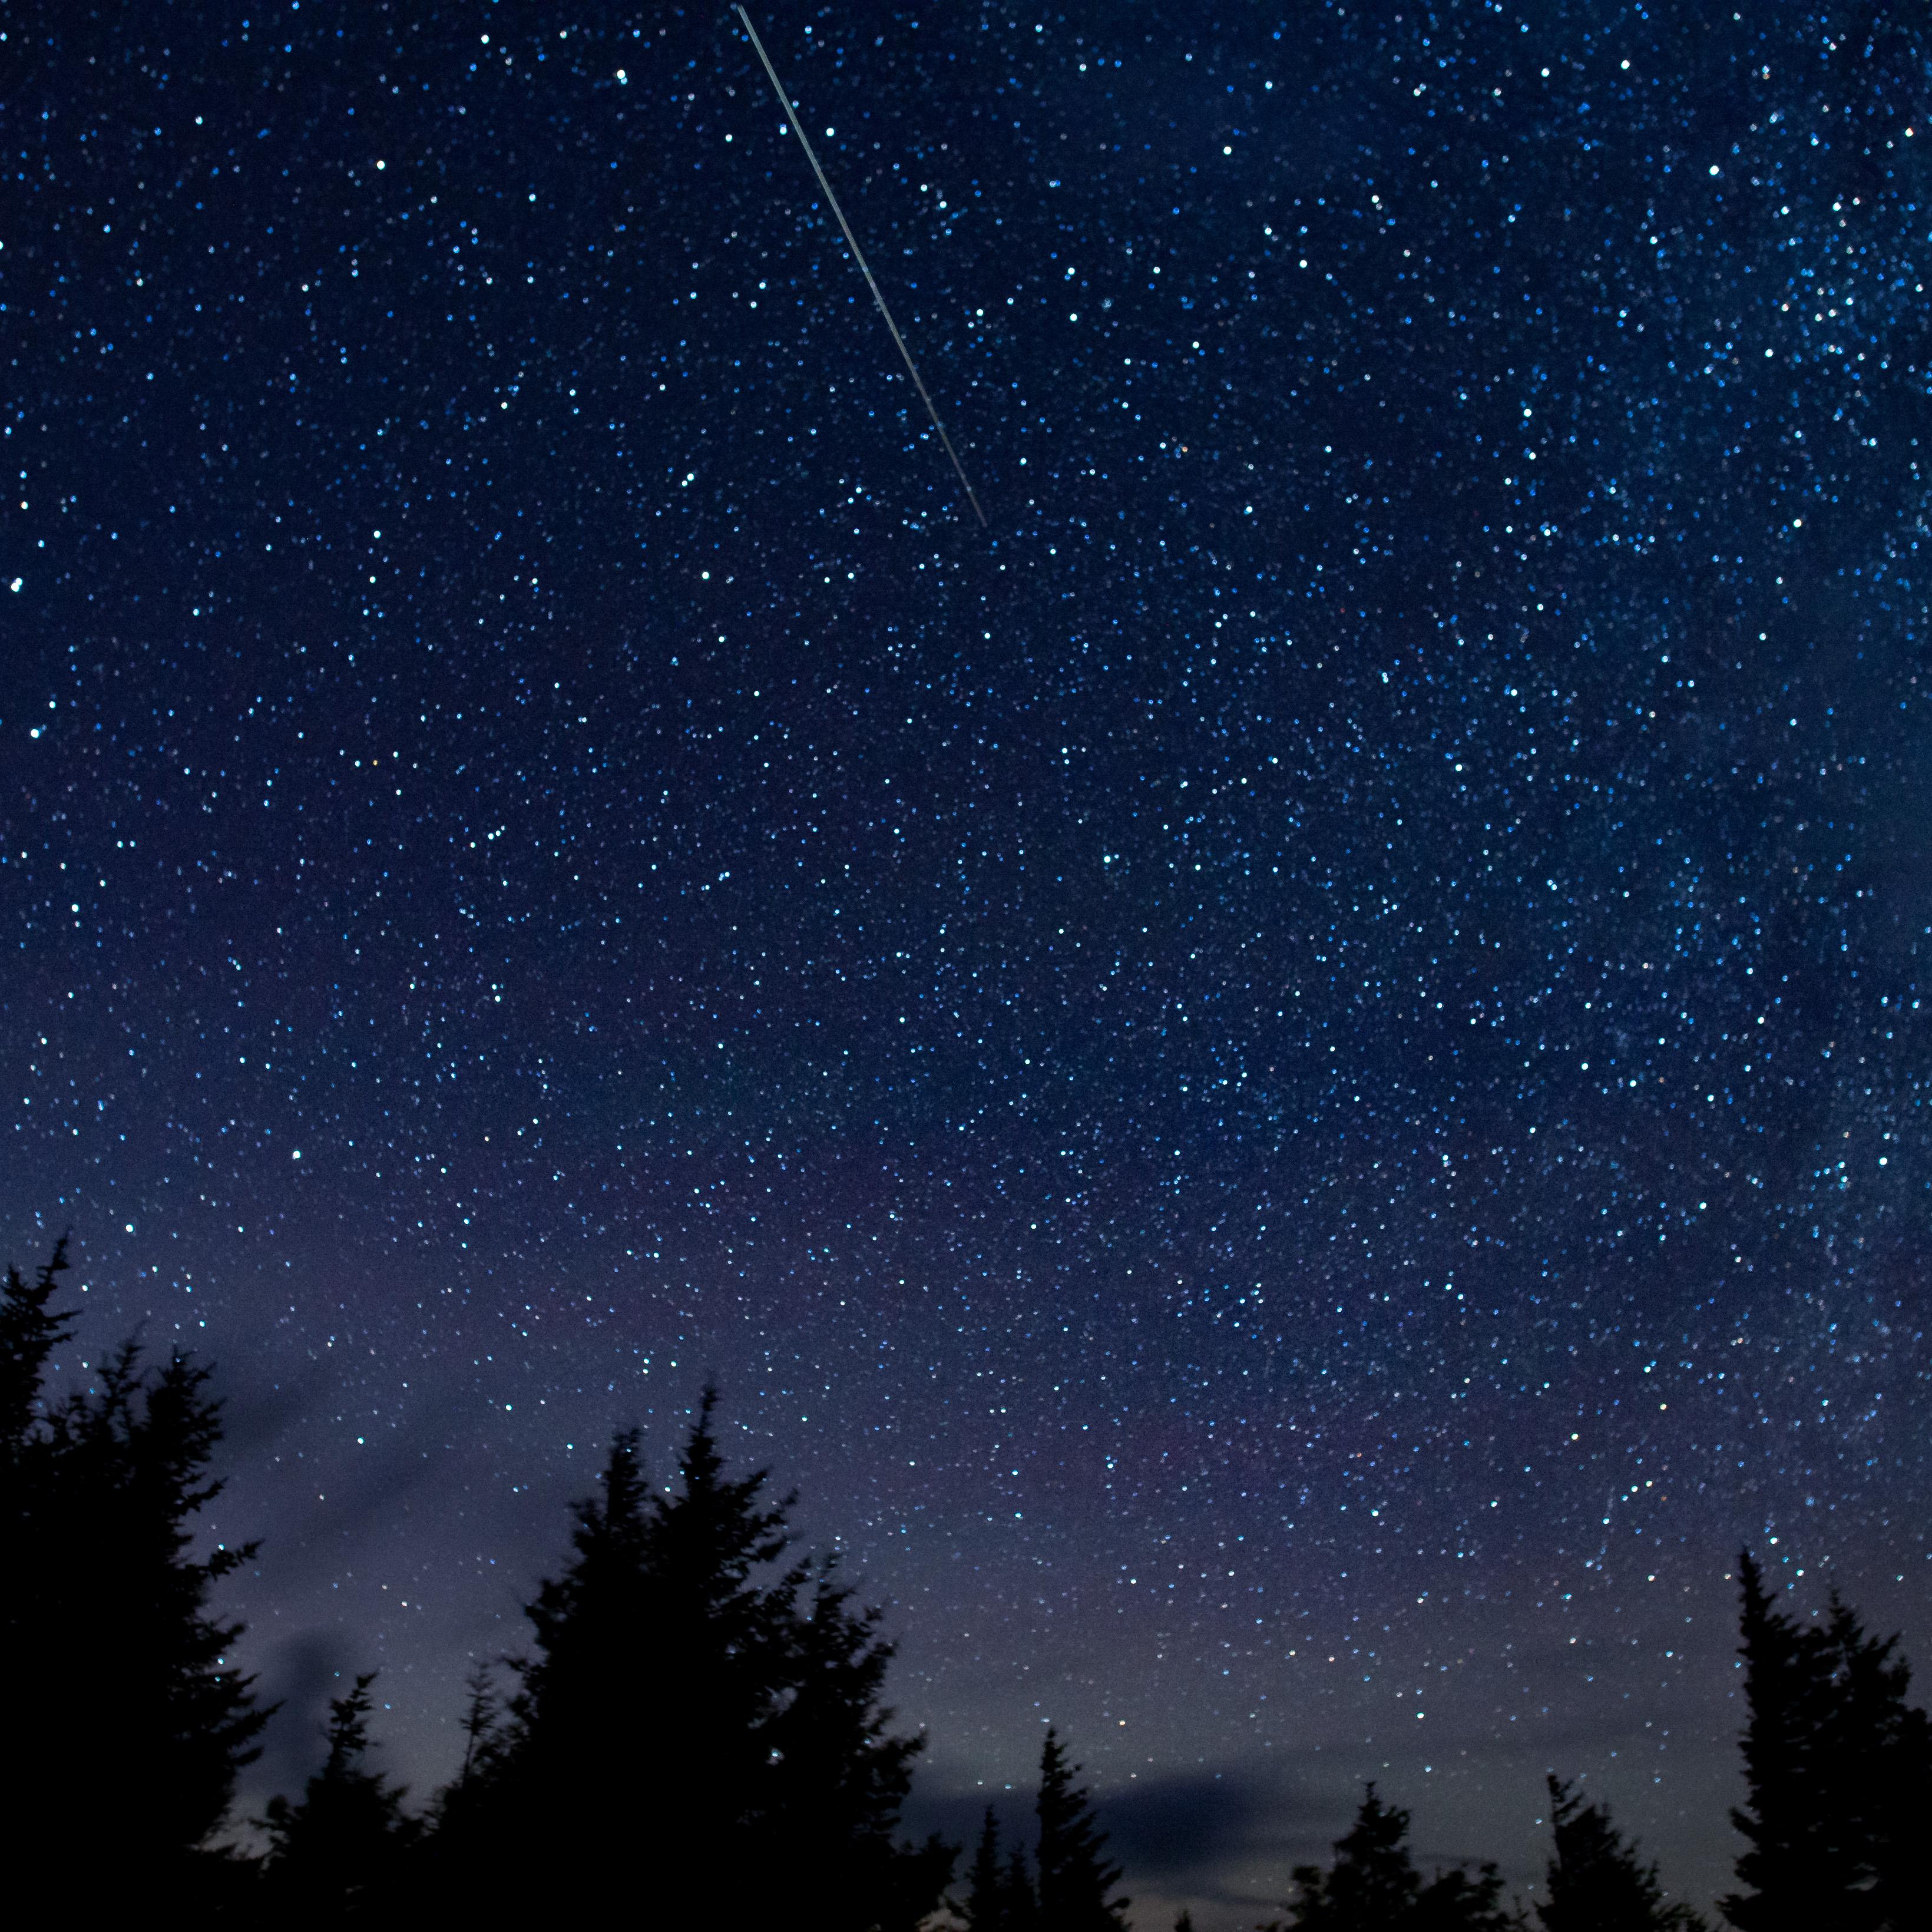 Perseid Meteor Shower - Canadian Space Agency